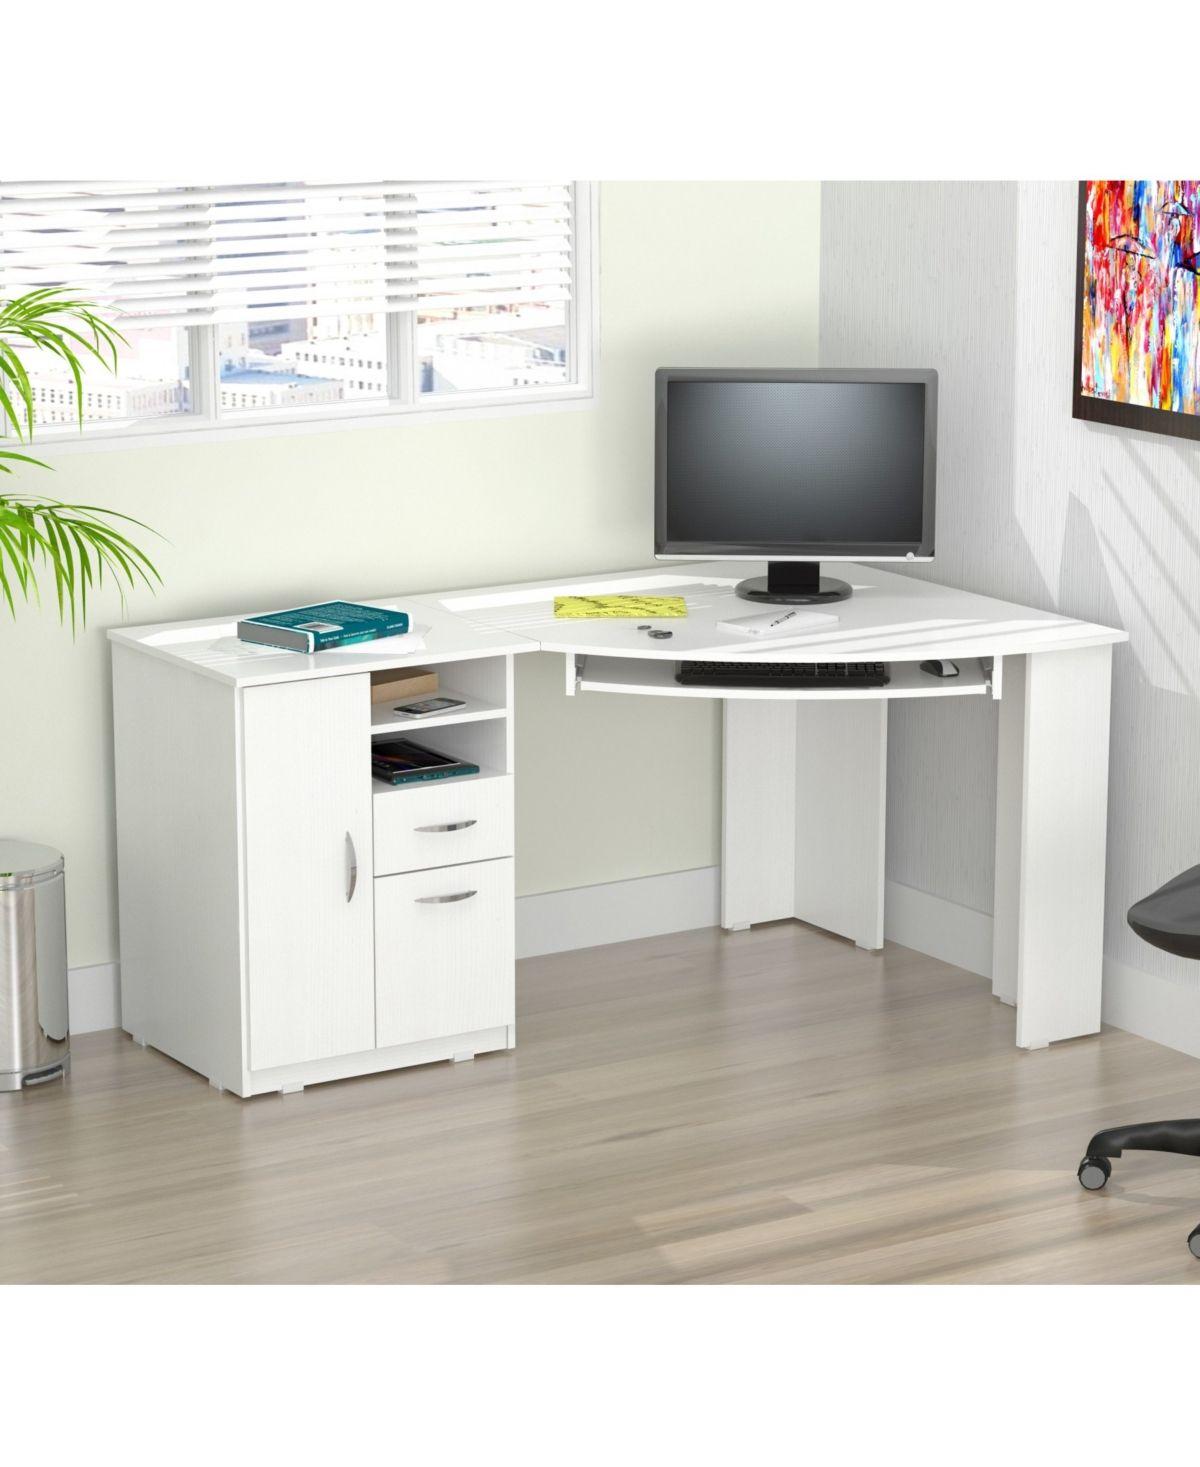 Inval America Corner Computer Desk & Reviews – Furniture – Macy's